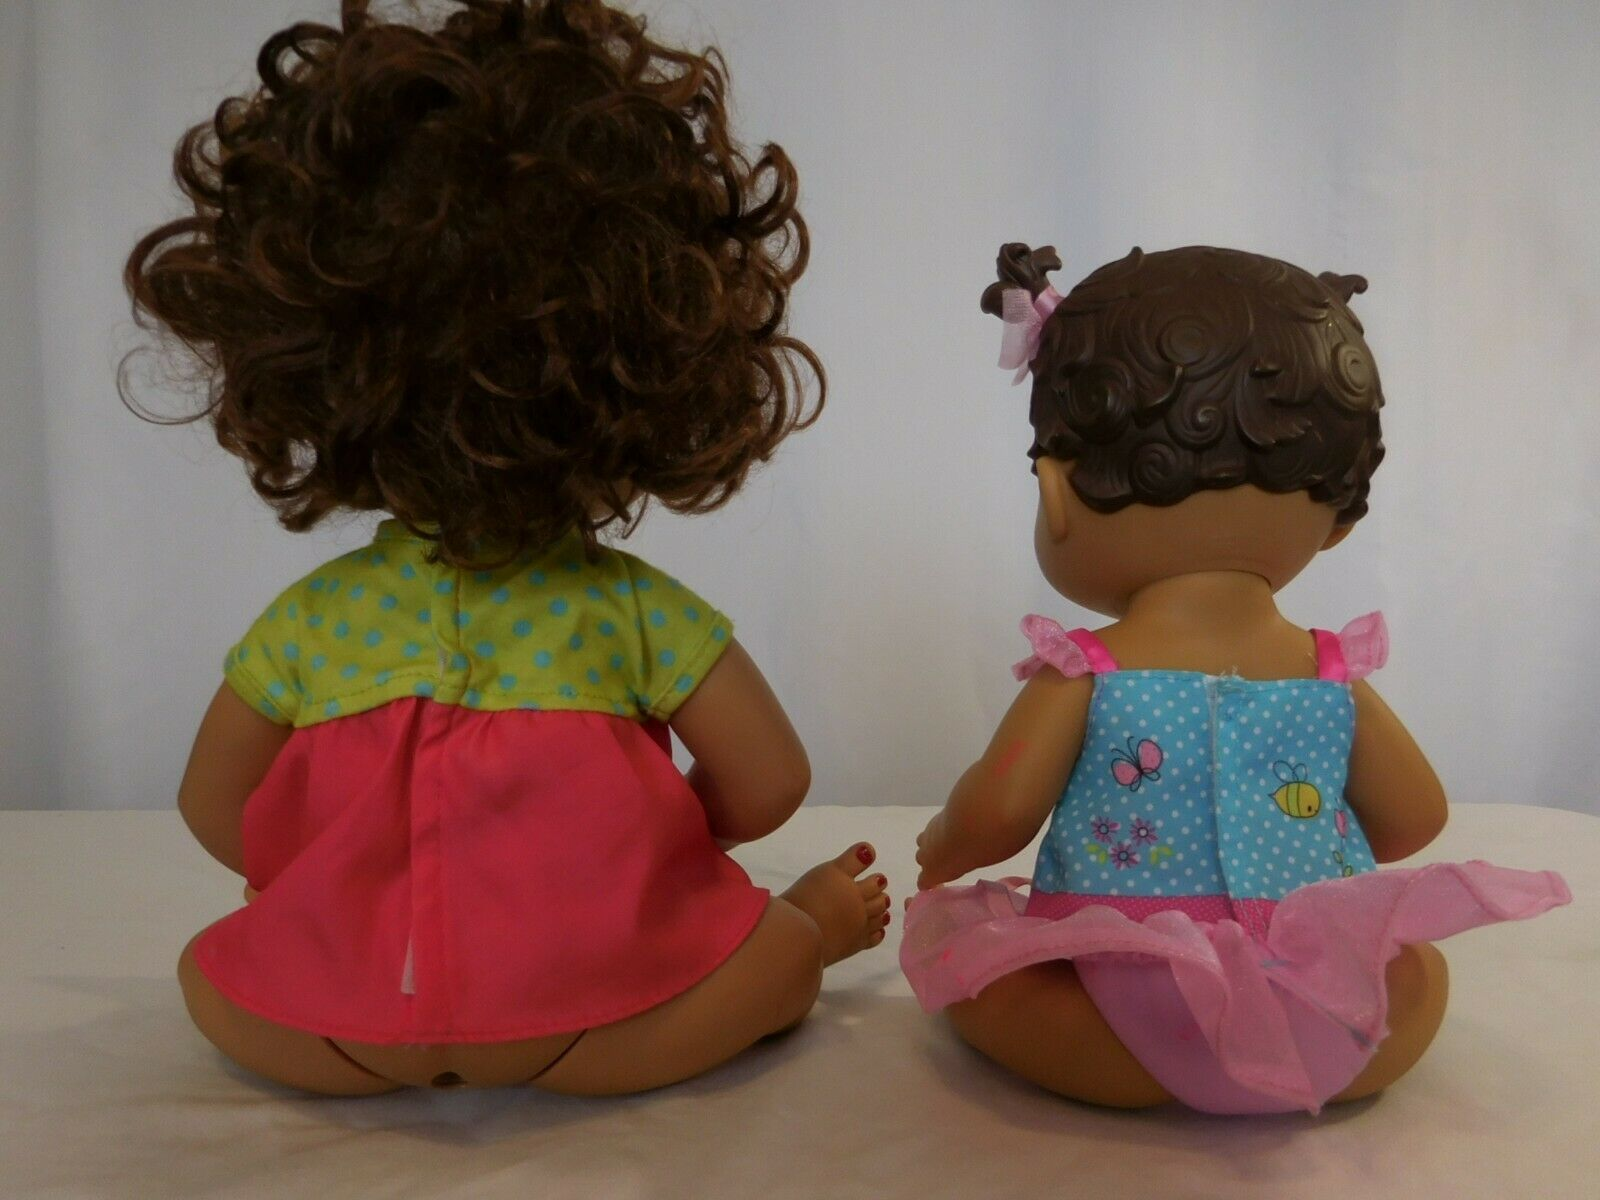 Baby Alive Hispanic Interactive Doll Eats & Poops + Yummy Treats Licks Ice Cream image 5